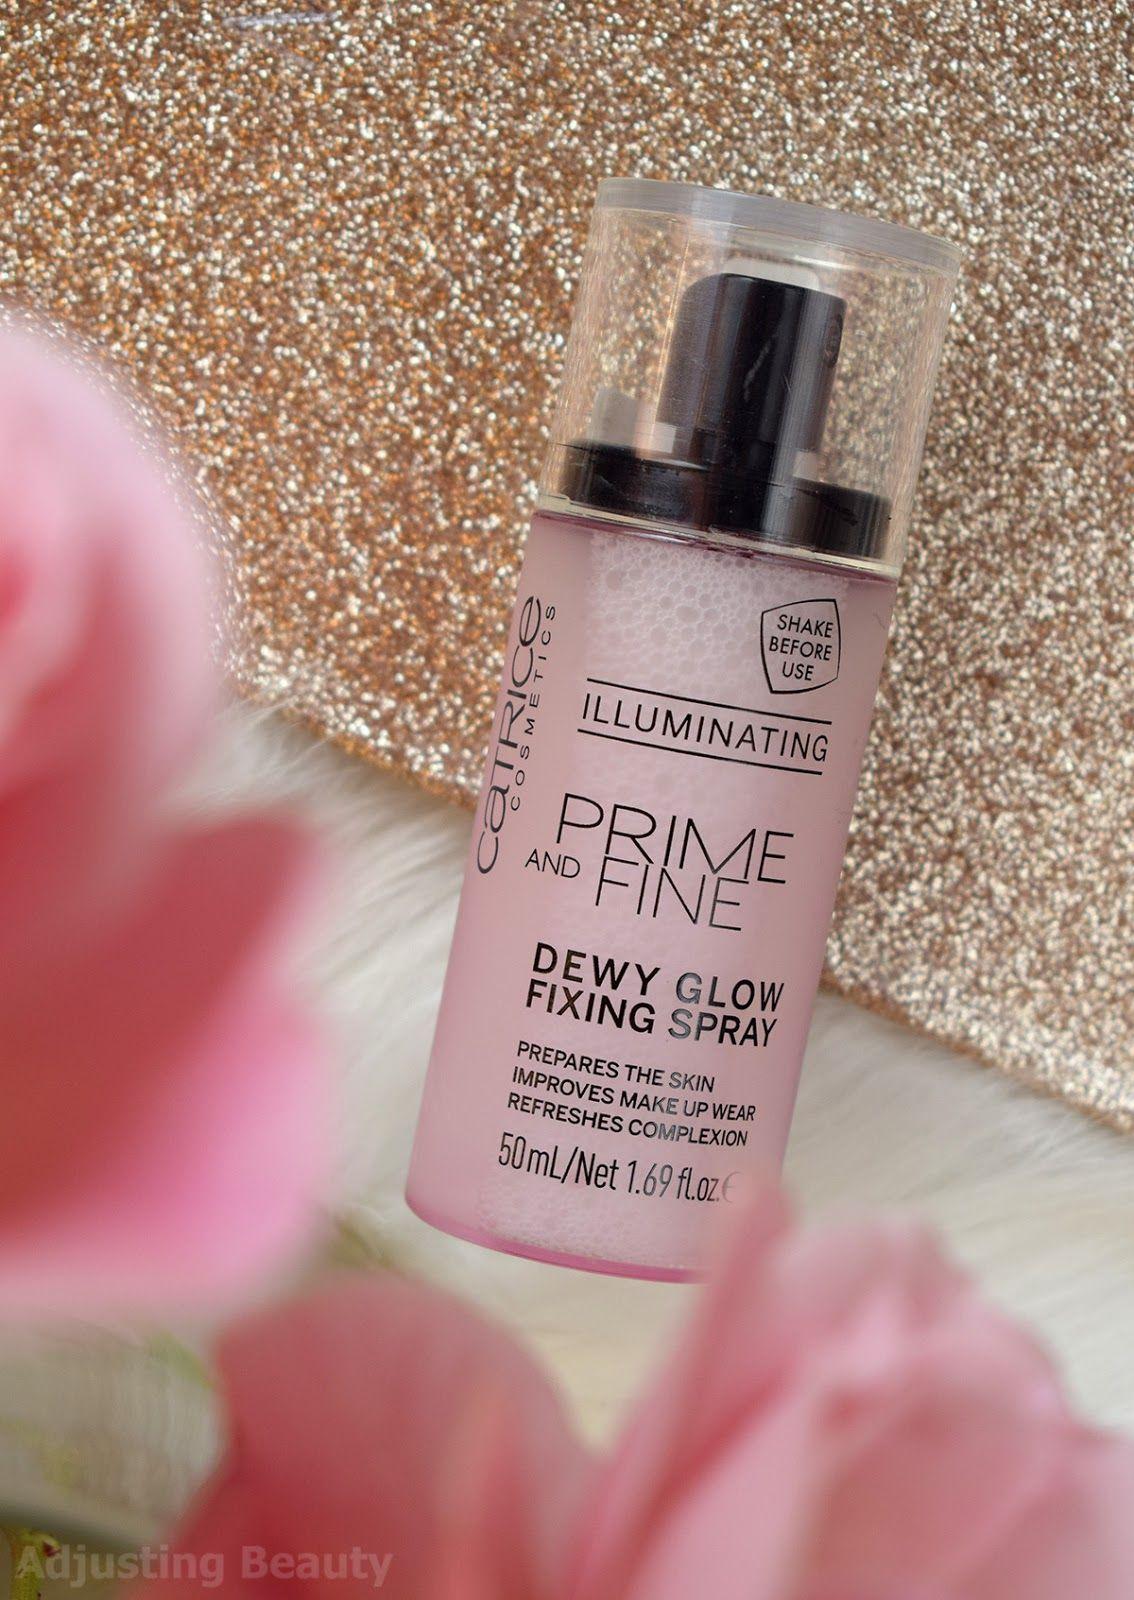 Prime And Fine Anti-Shine Fixing Spray - Matt Finish by Catrice Cosmetics #15